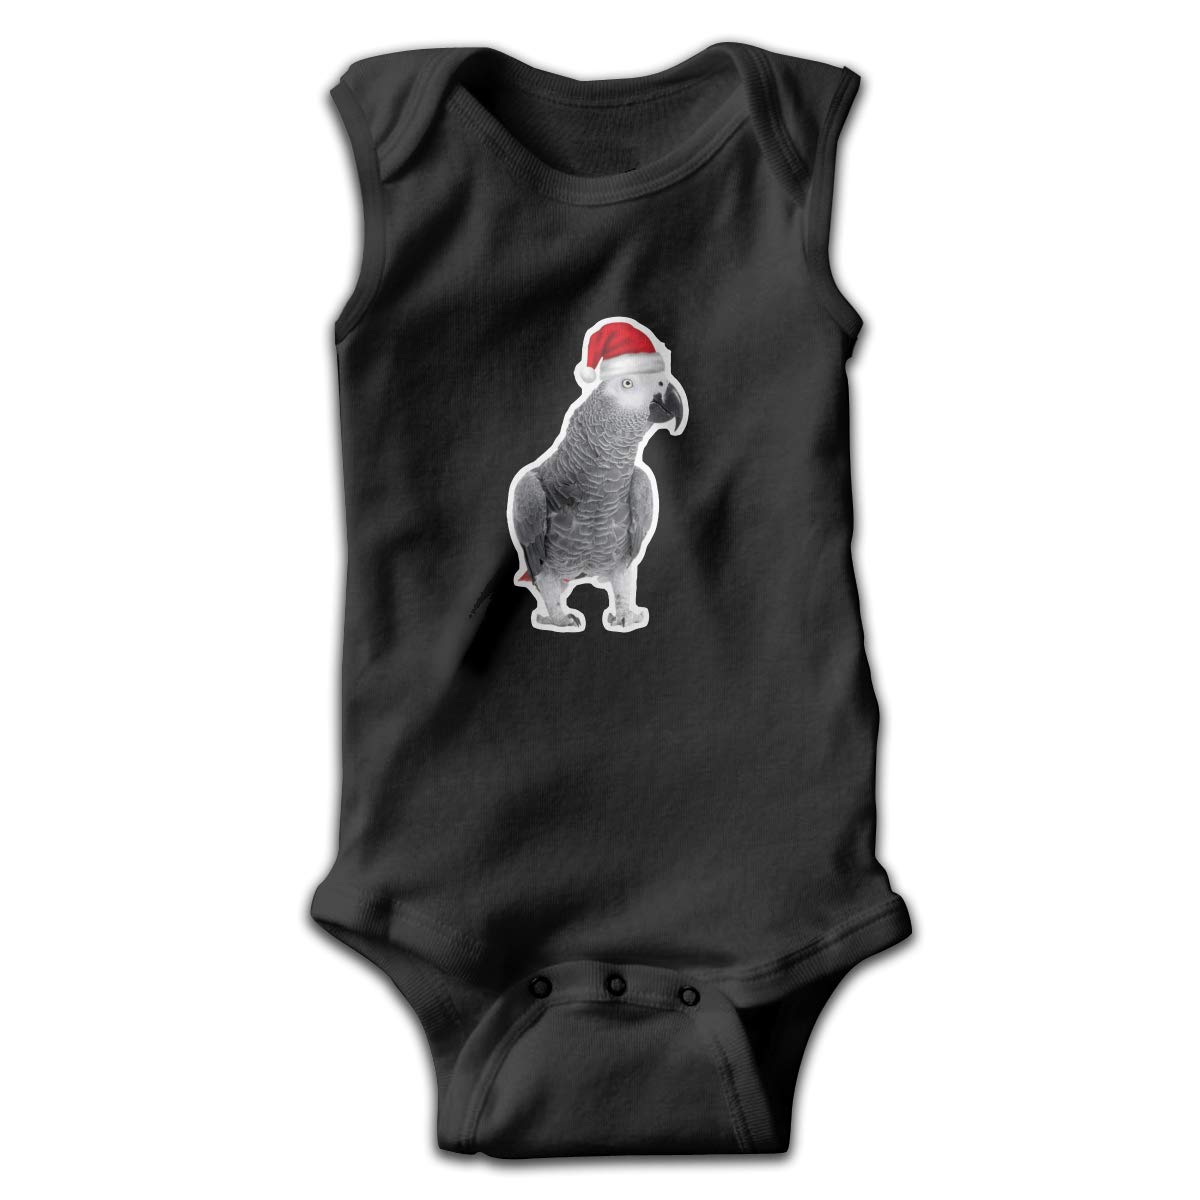 Parrots with Christmas Hats Newborn Crawling Suit Sleeveless Romper Bodysuit Onesies Jumpsuit Black